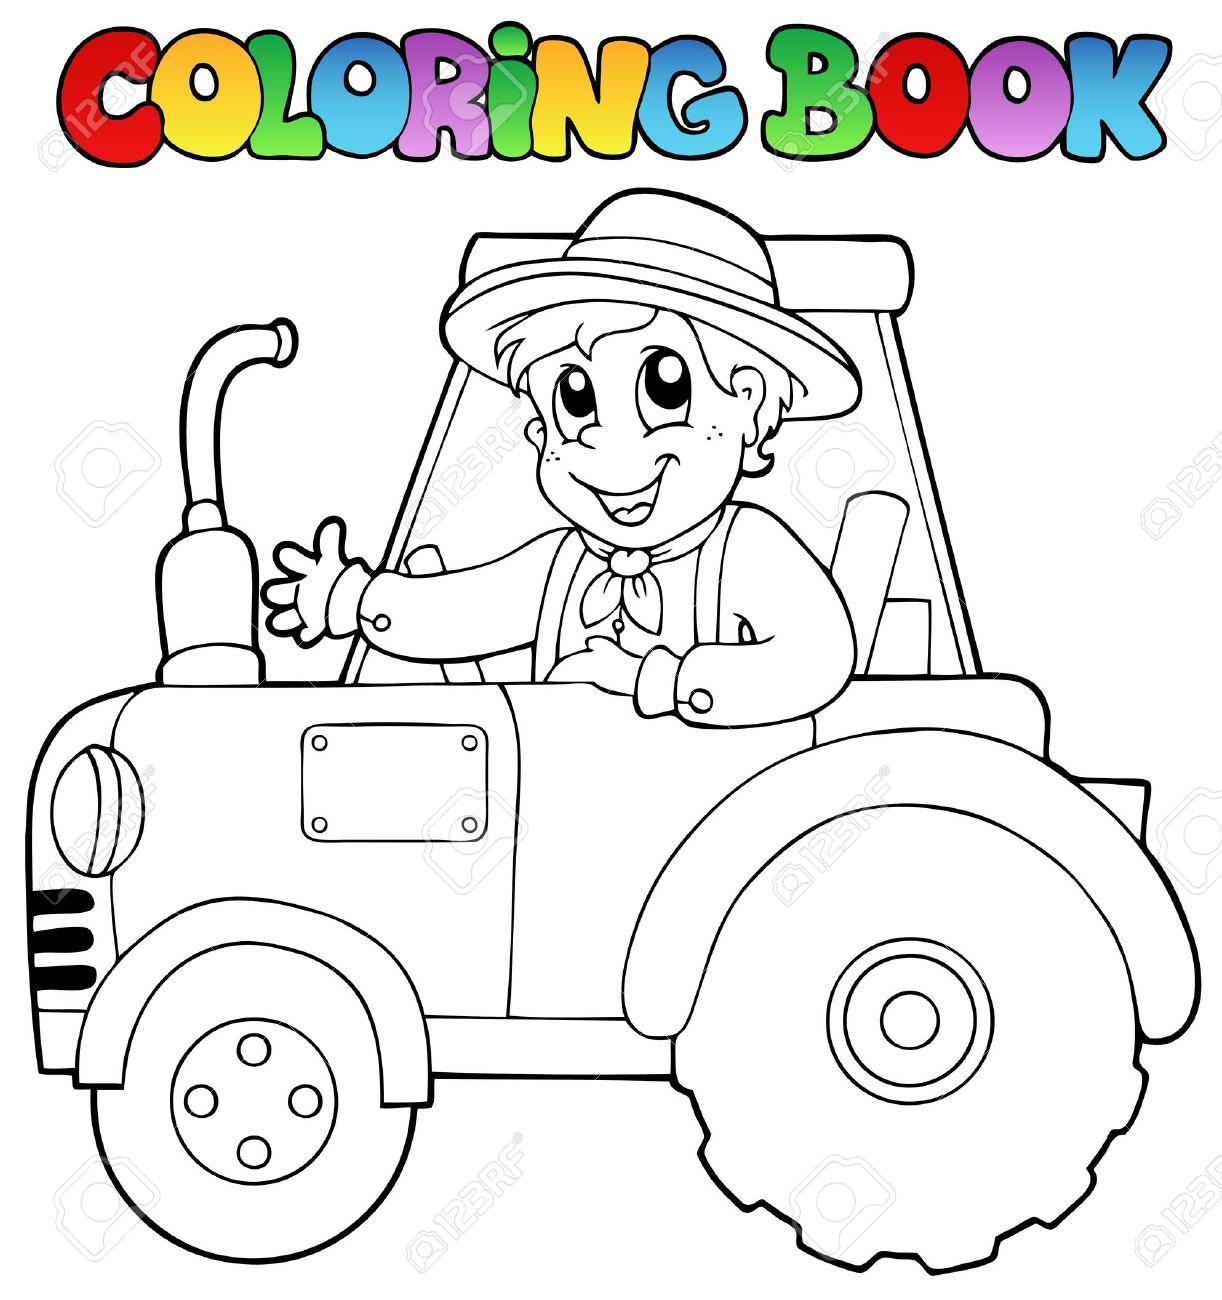 Coloring book farmer on tractor - vector illustration Stock Vector - 13356169